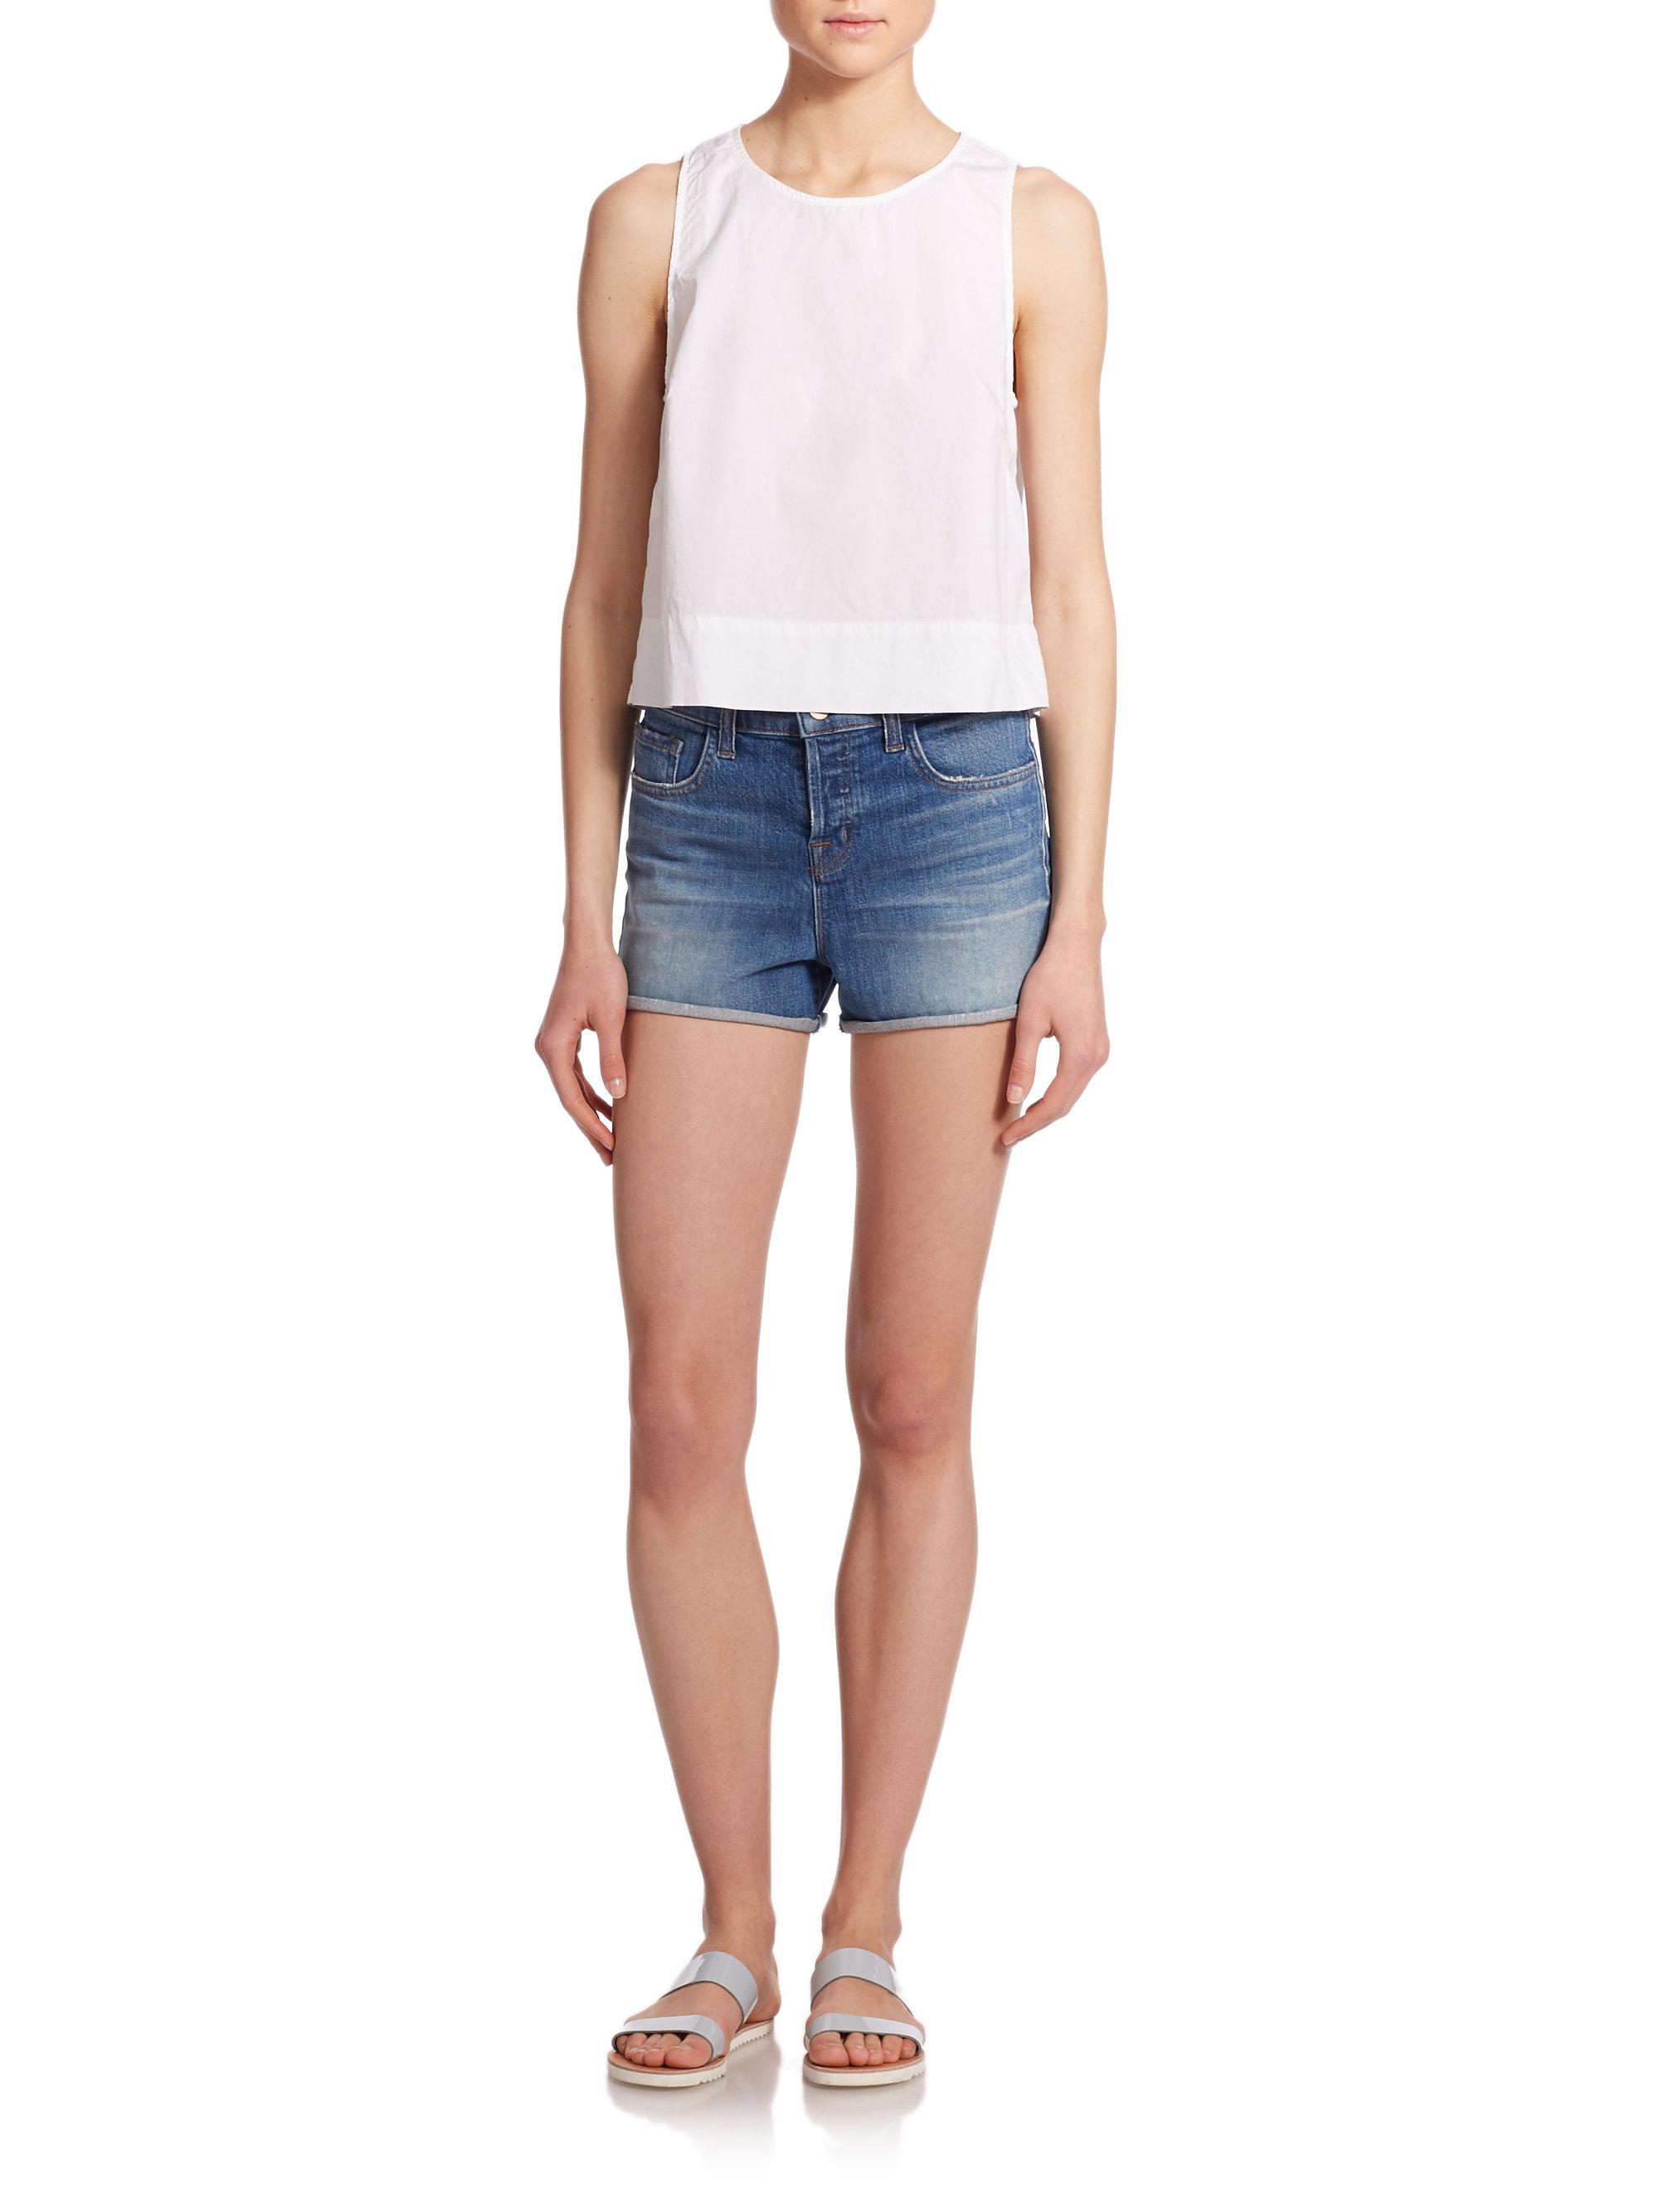 Womens Black Jean Shorts